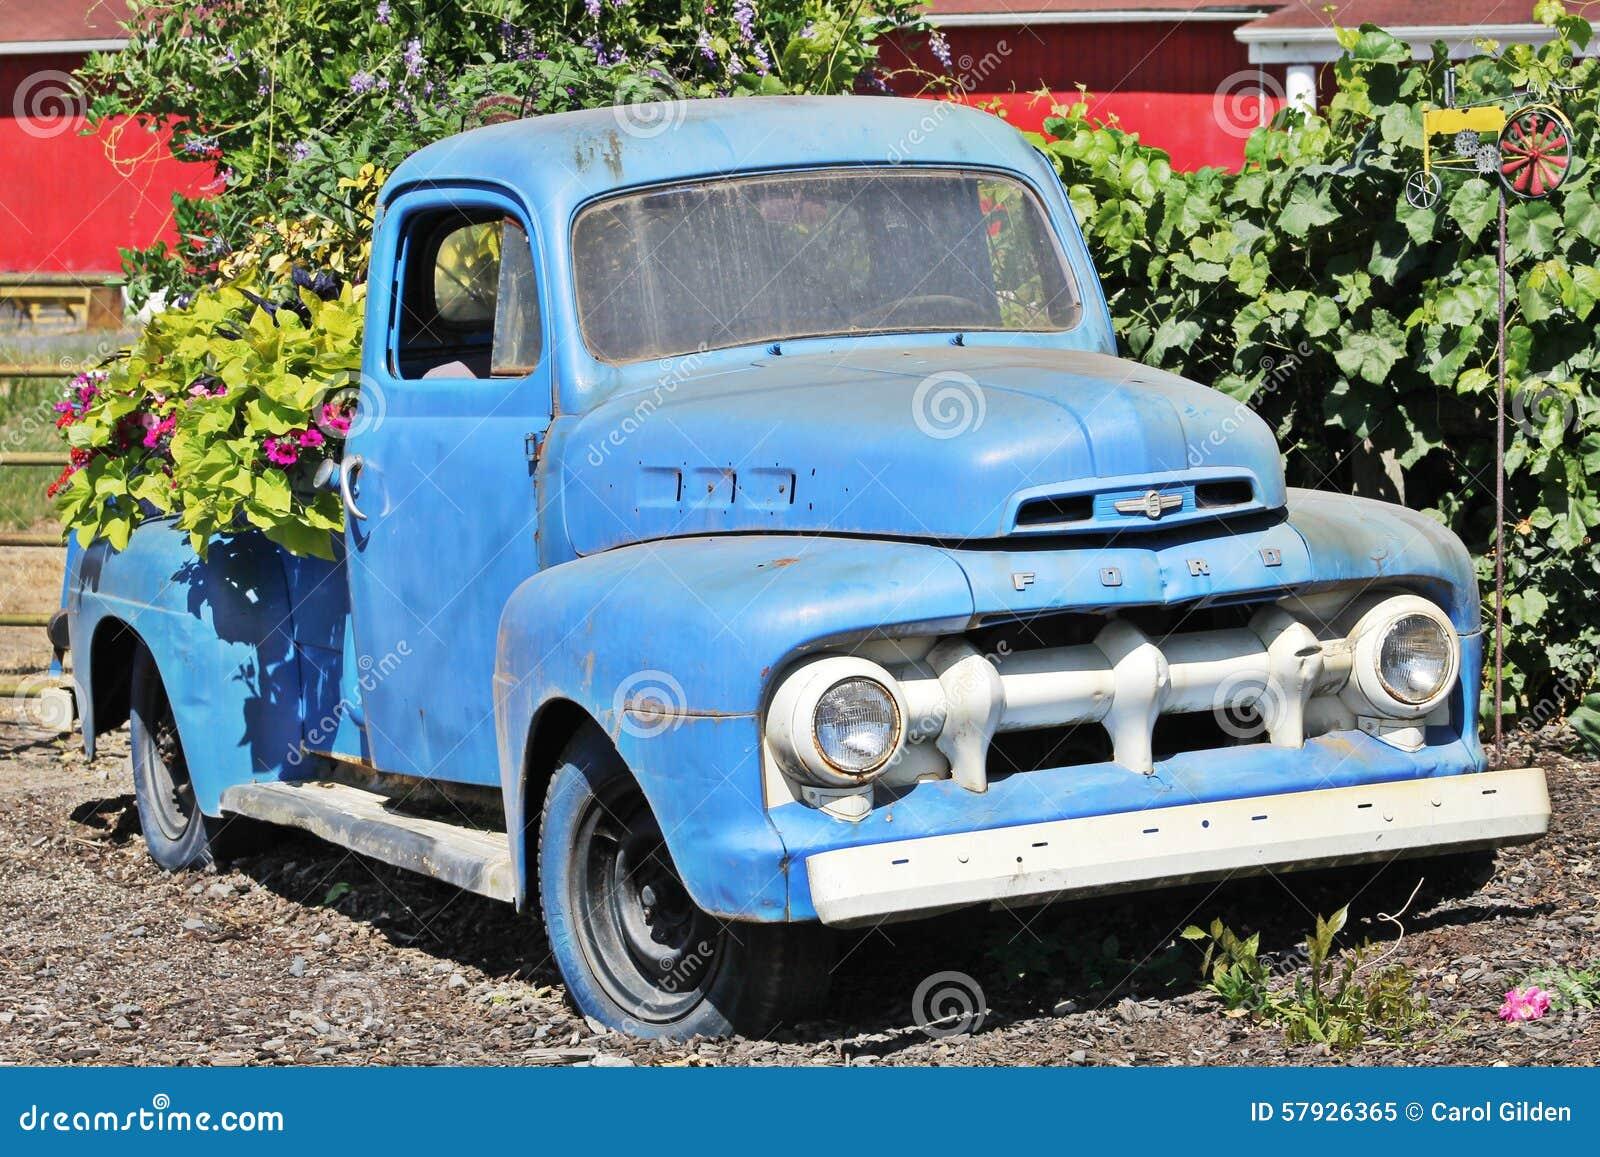 Ford  New Cars Trucks SUVs Crossovers amp Hybrids